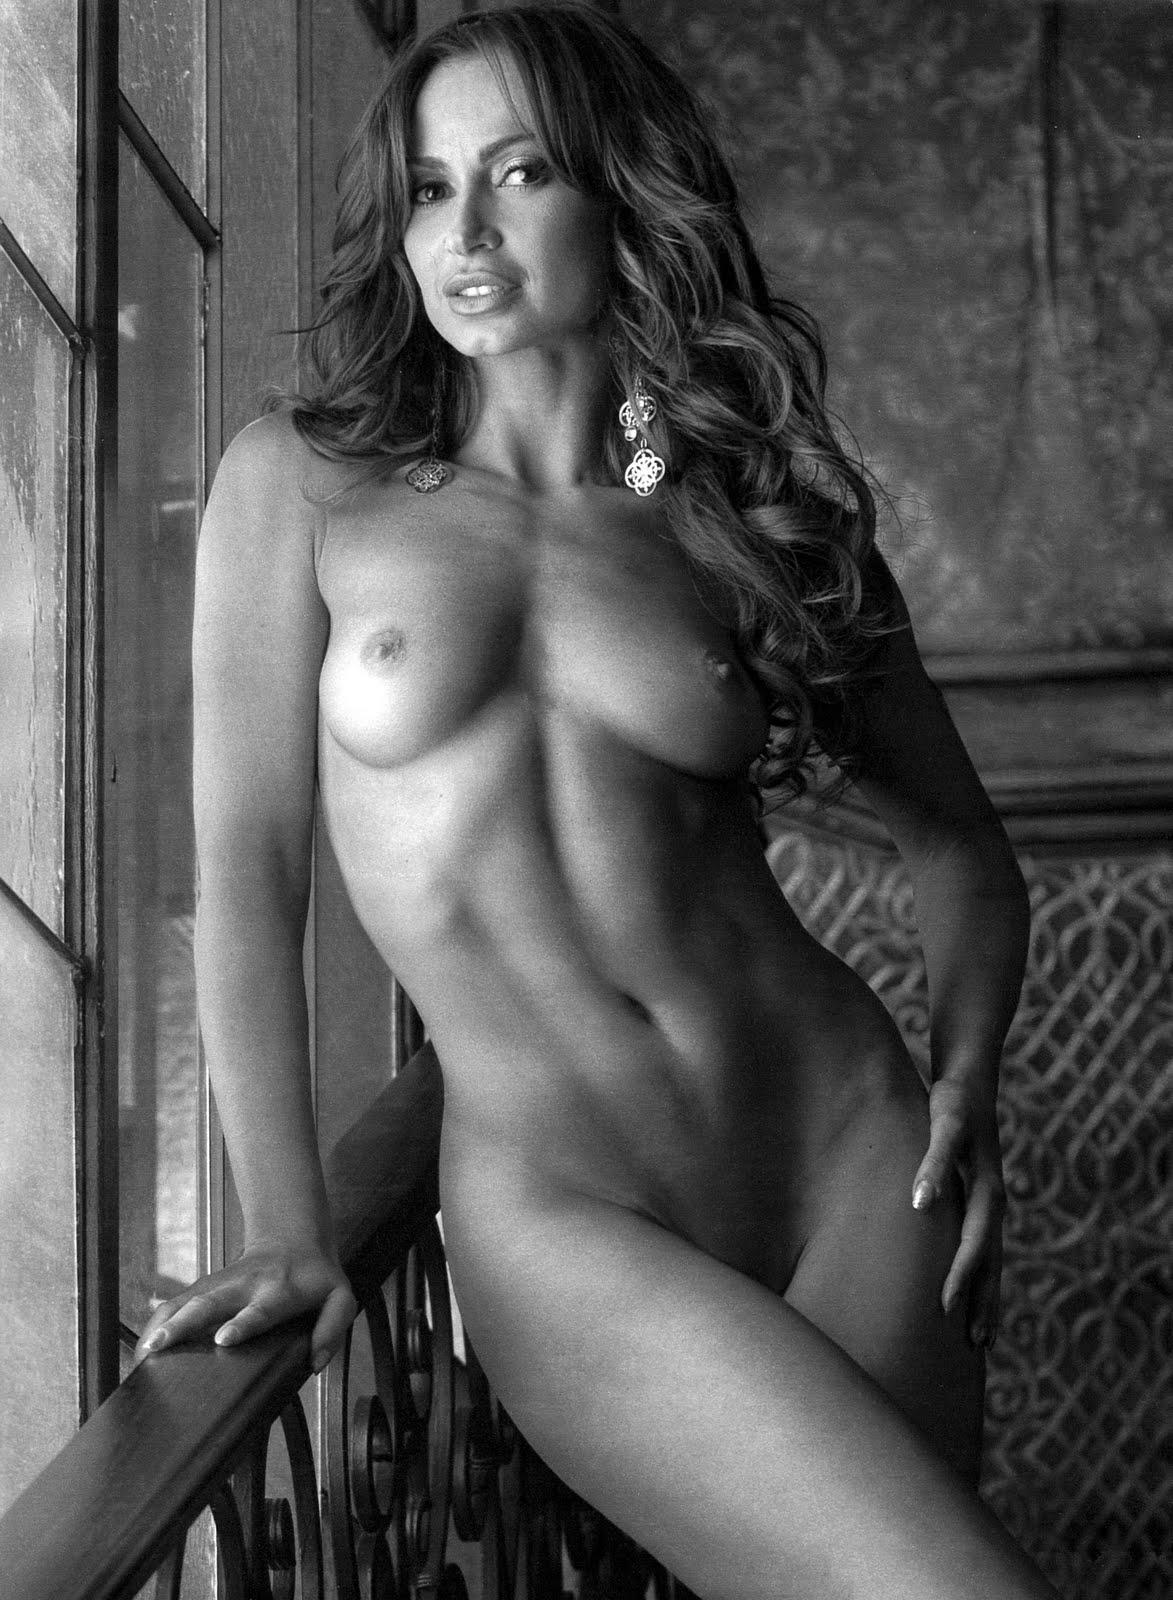 Katrina Smirnoff Nude 49